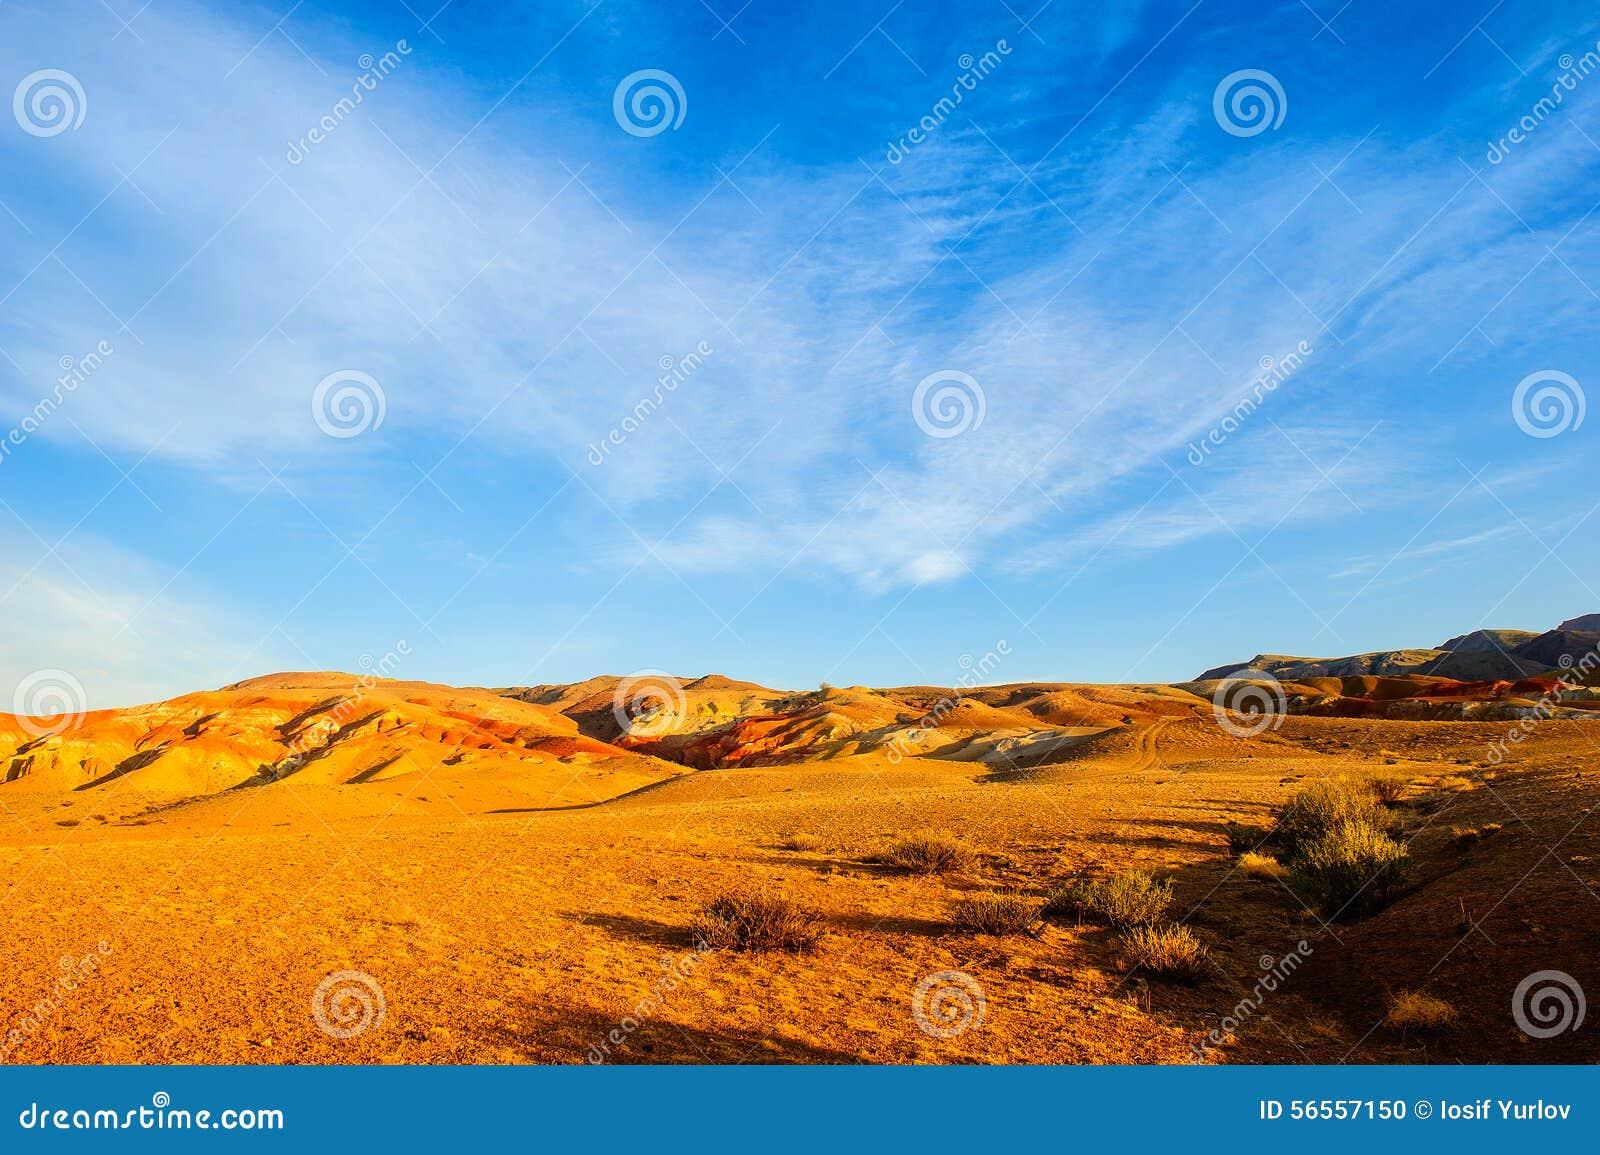 Download Χώμα χρώματος των καταθέσεων υδραργύρου σε Altai Στοκ Εικόνες - εικόνα από κενός, χώρα: 56557150